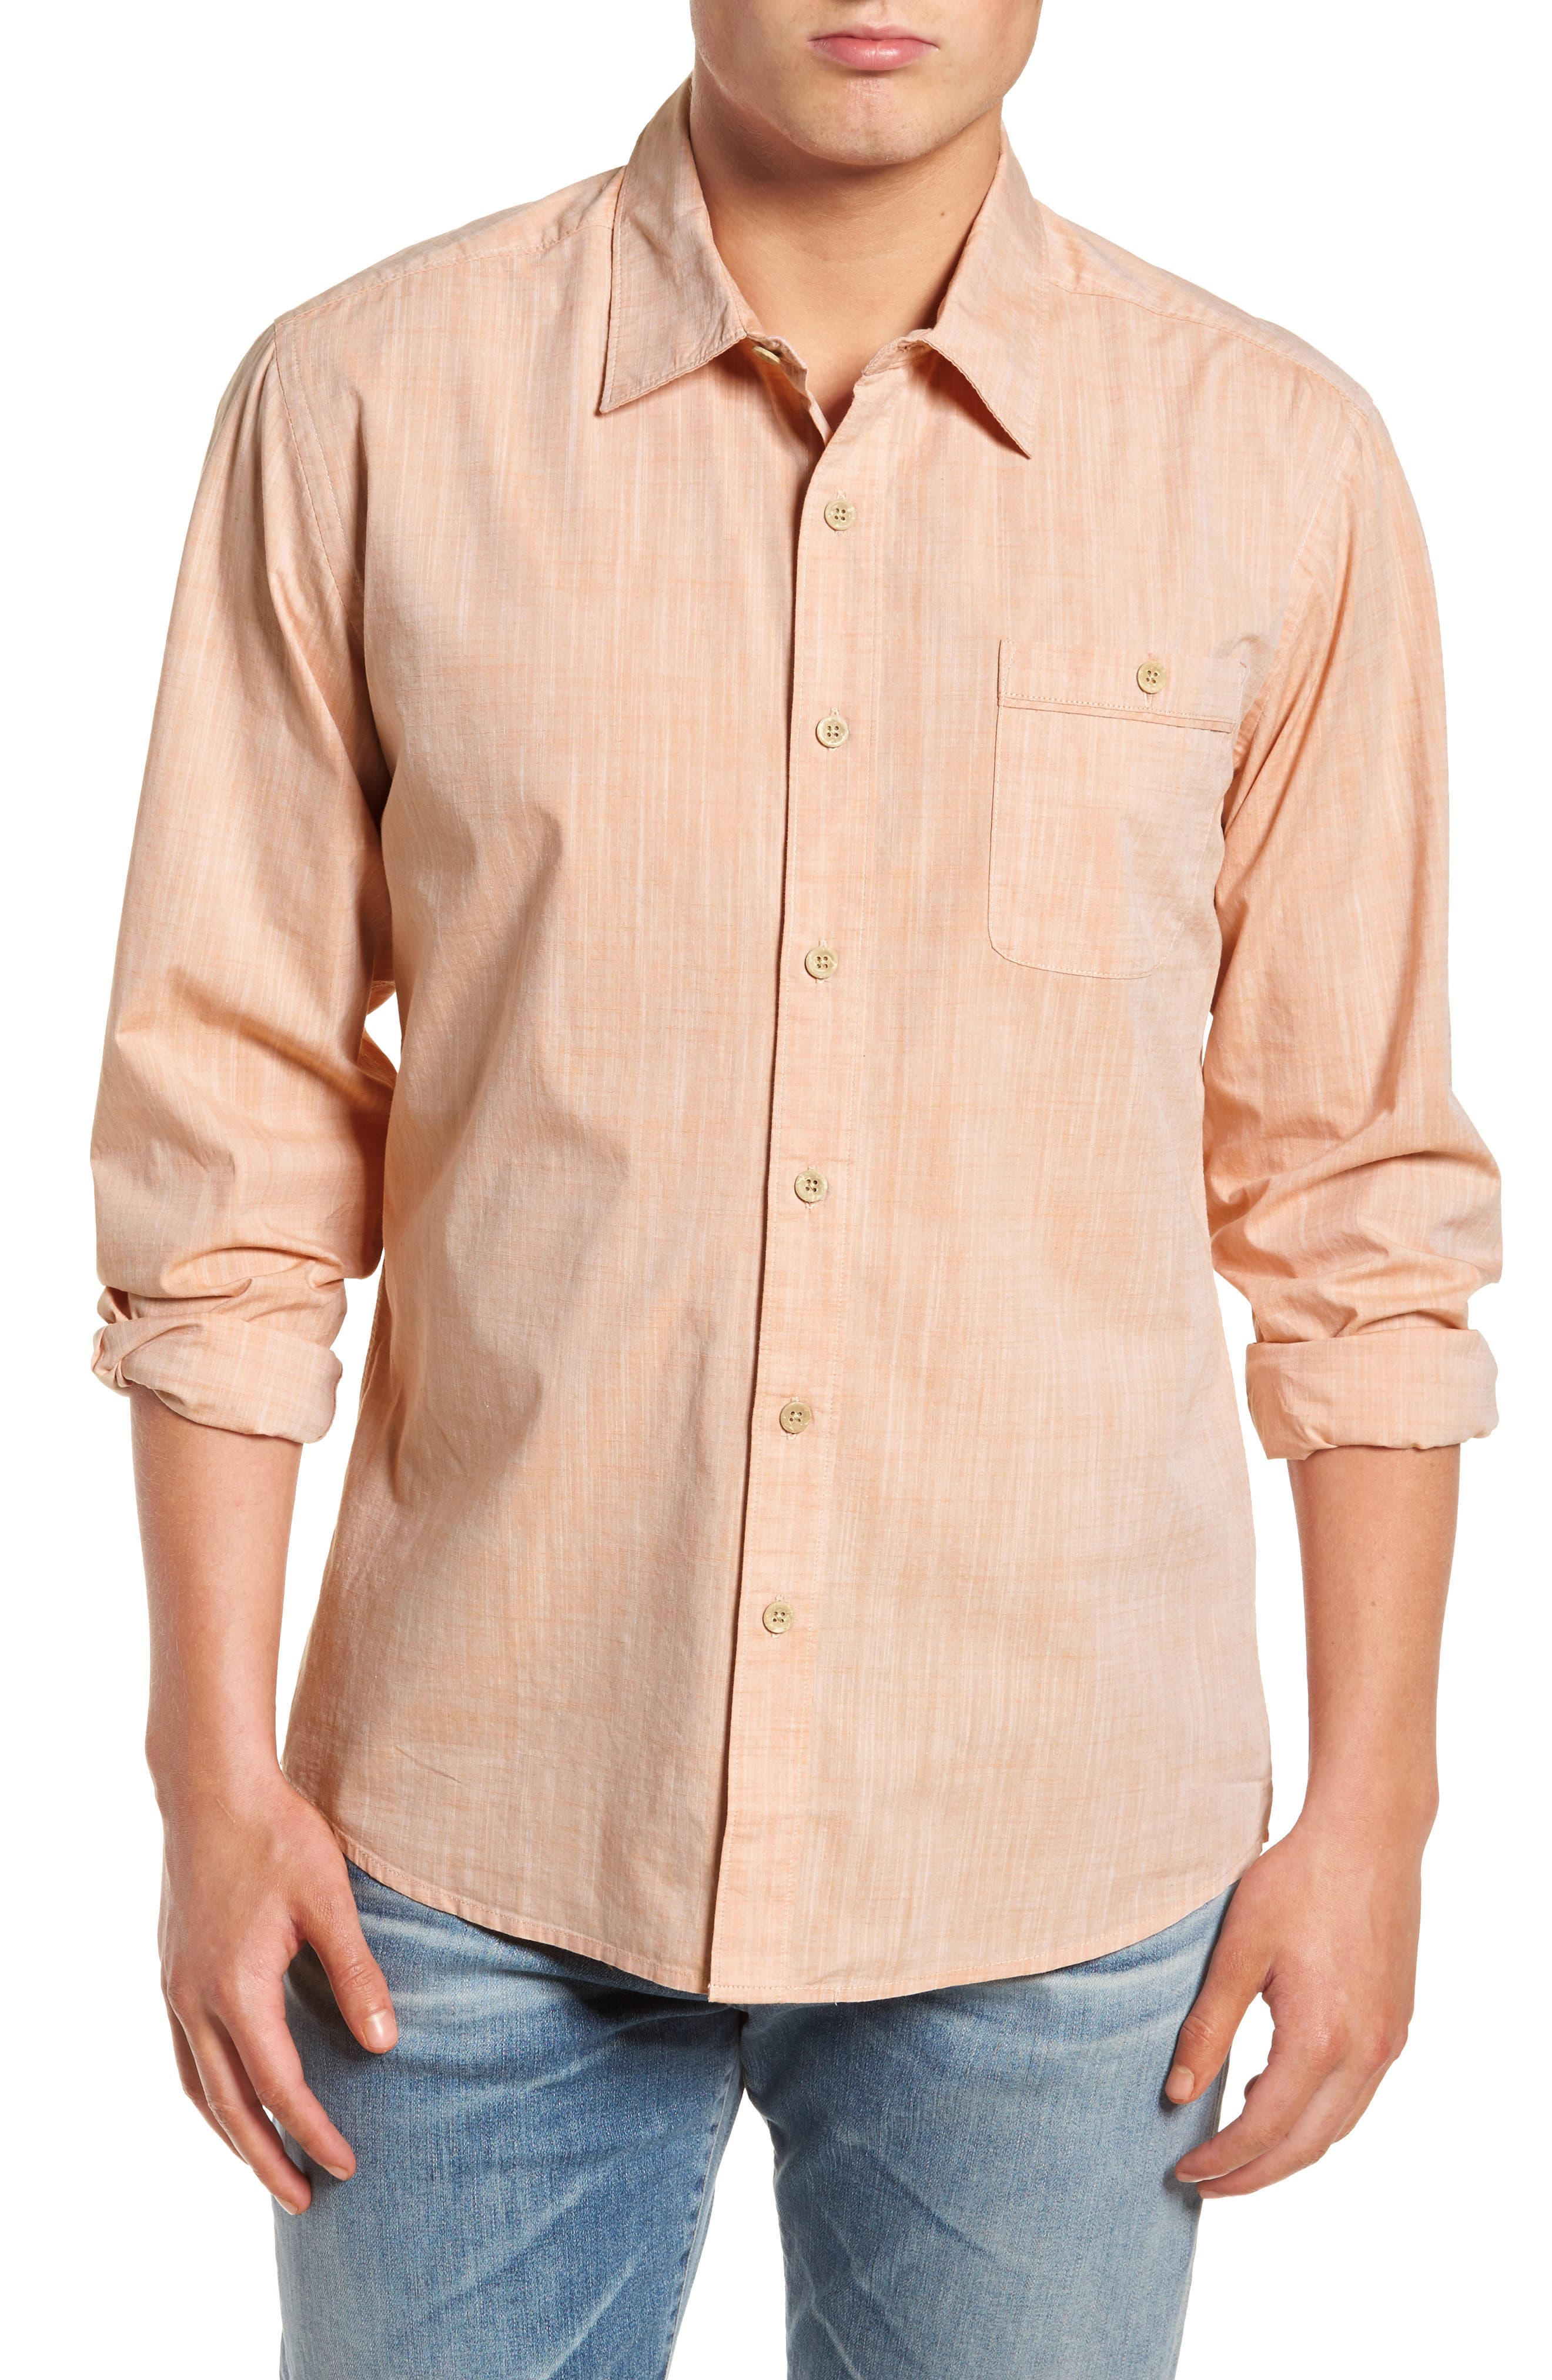 Mai Tai Regular Fit Sport Shirt,                             Main thumbnail 1, color,